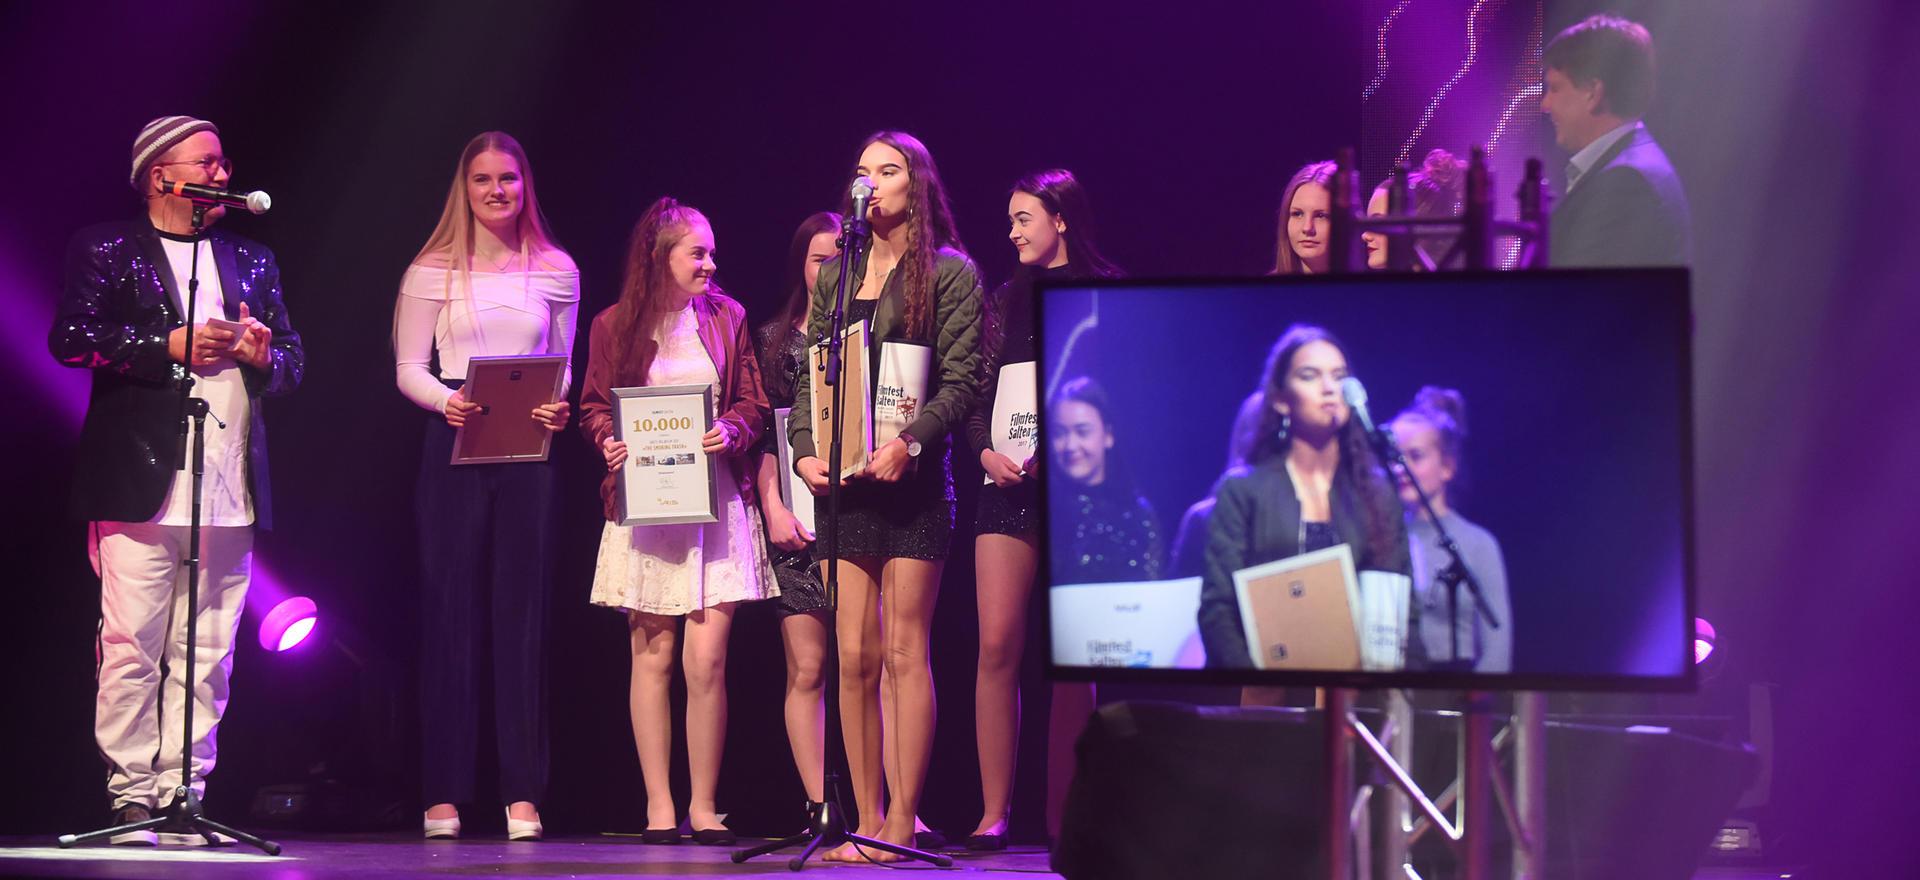 The Smoking Trash var navnet på filmen som vant Miljøprisen under Filmfest Salten.